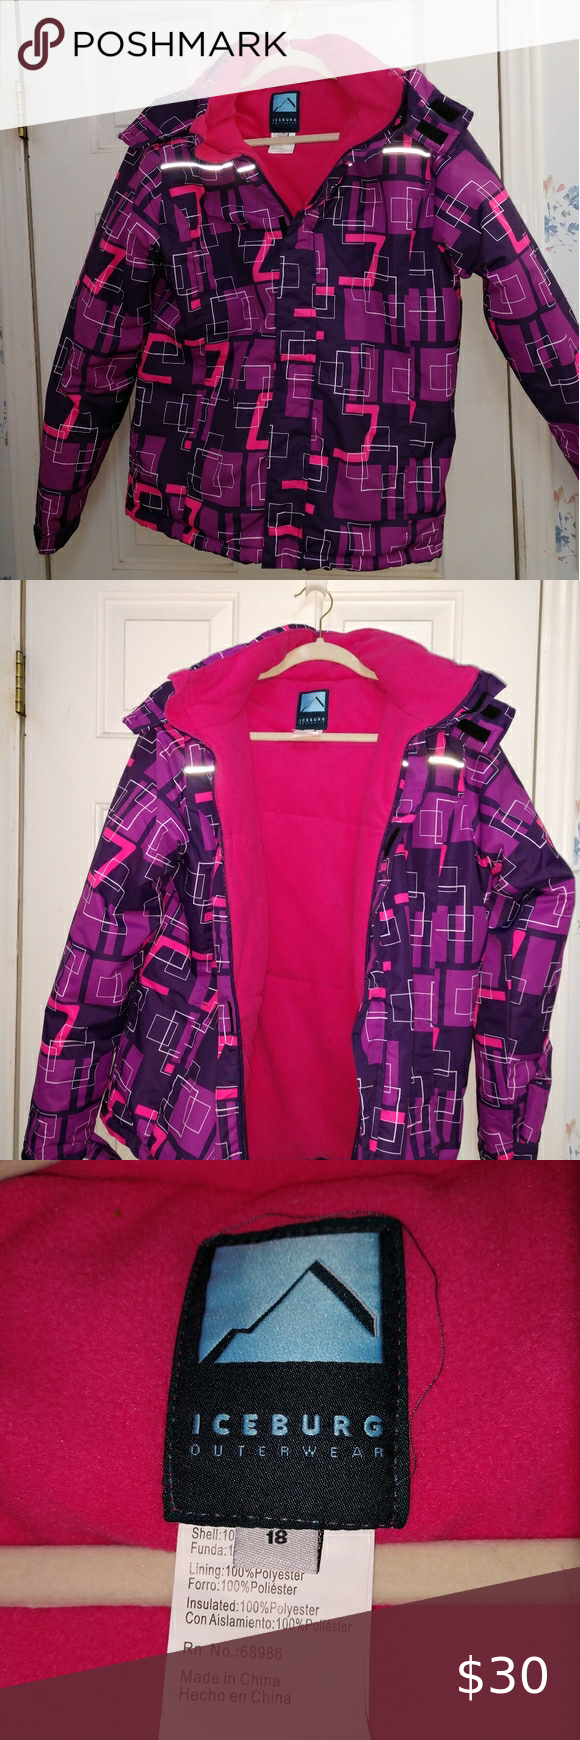 Iceberg Outerwear Geometric Winter Snow Jacket Clothes Design Fashion Fashion Trends [ 1740 x 580 Pixel ]